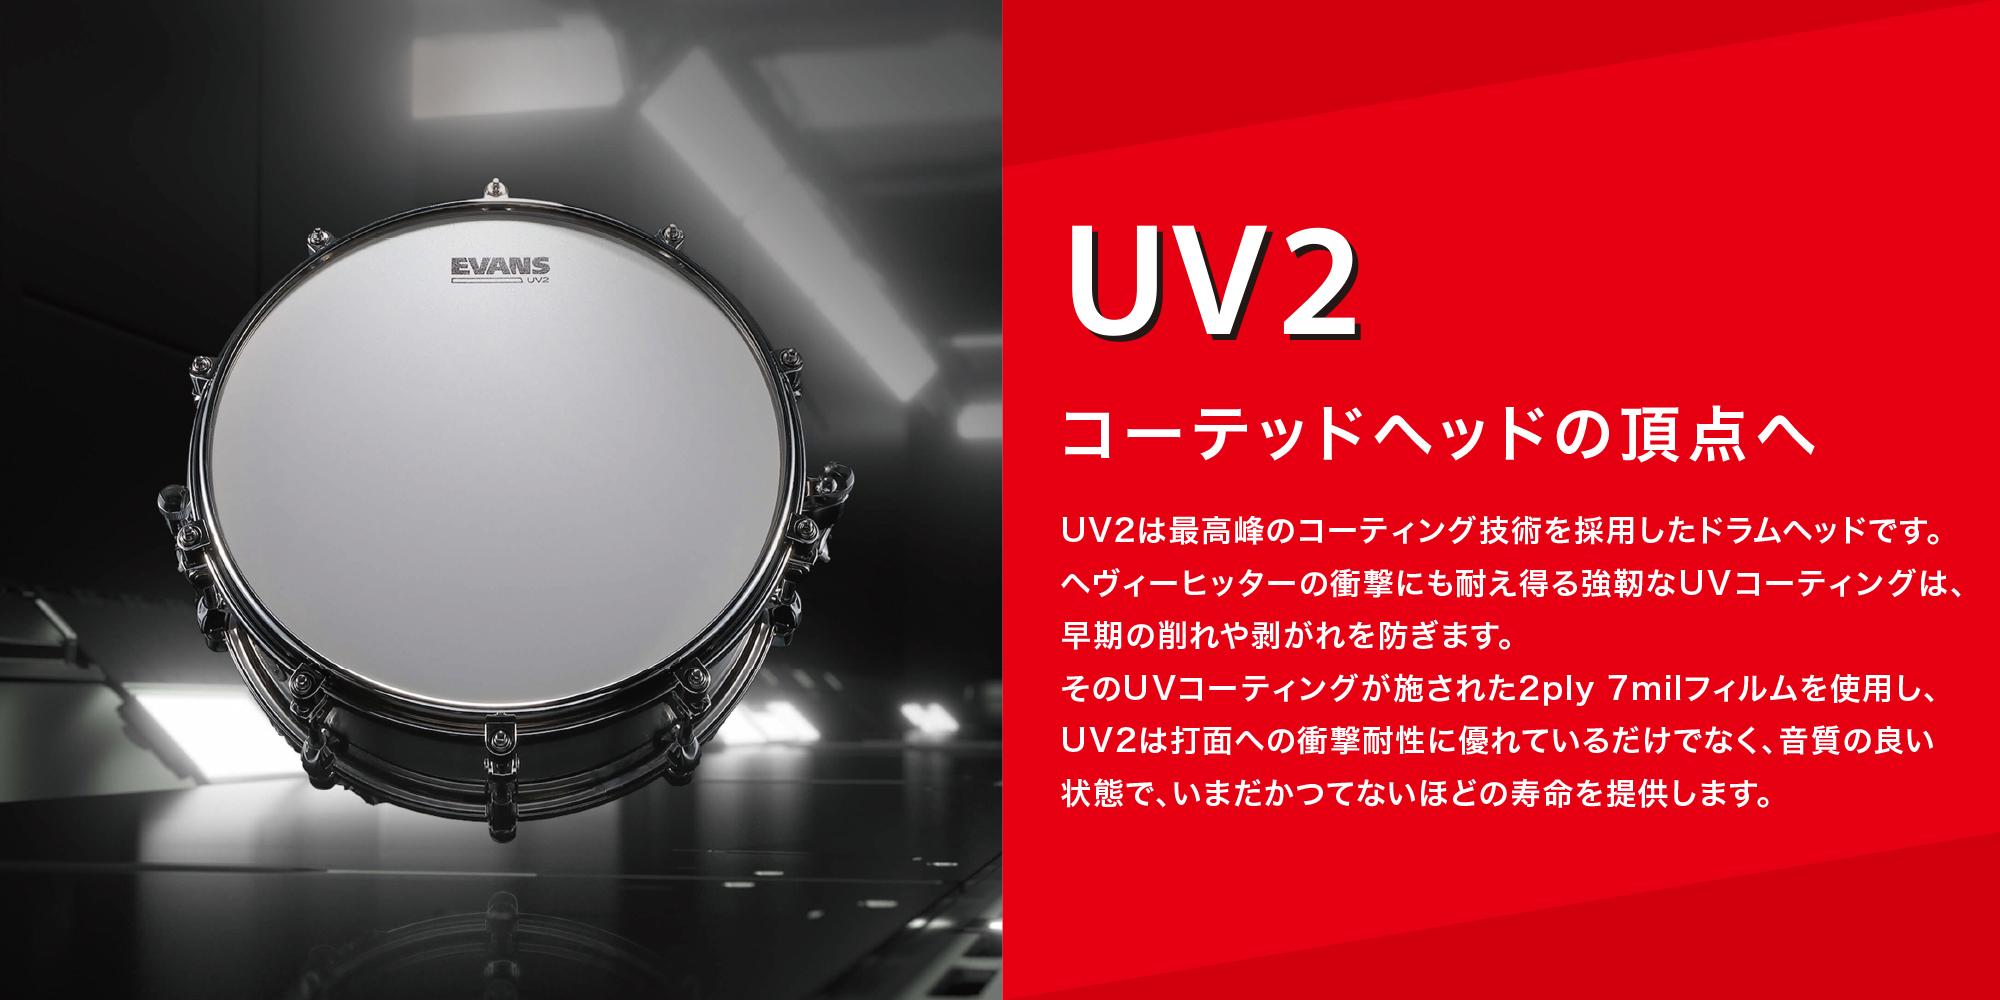 EVANS 新製品 UV2 発売のご案内